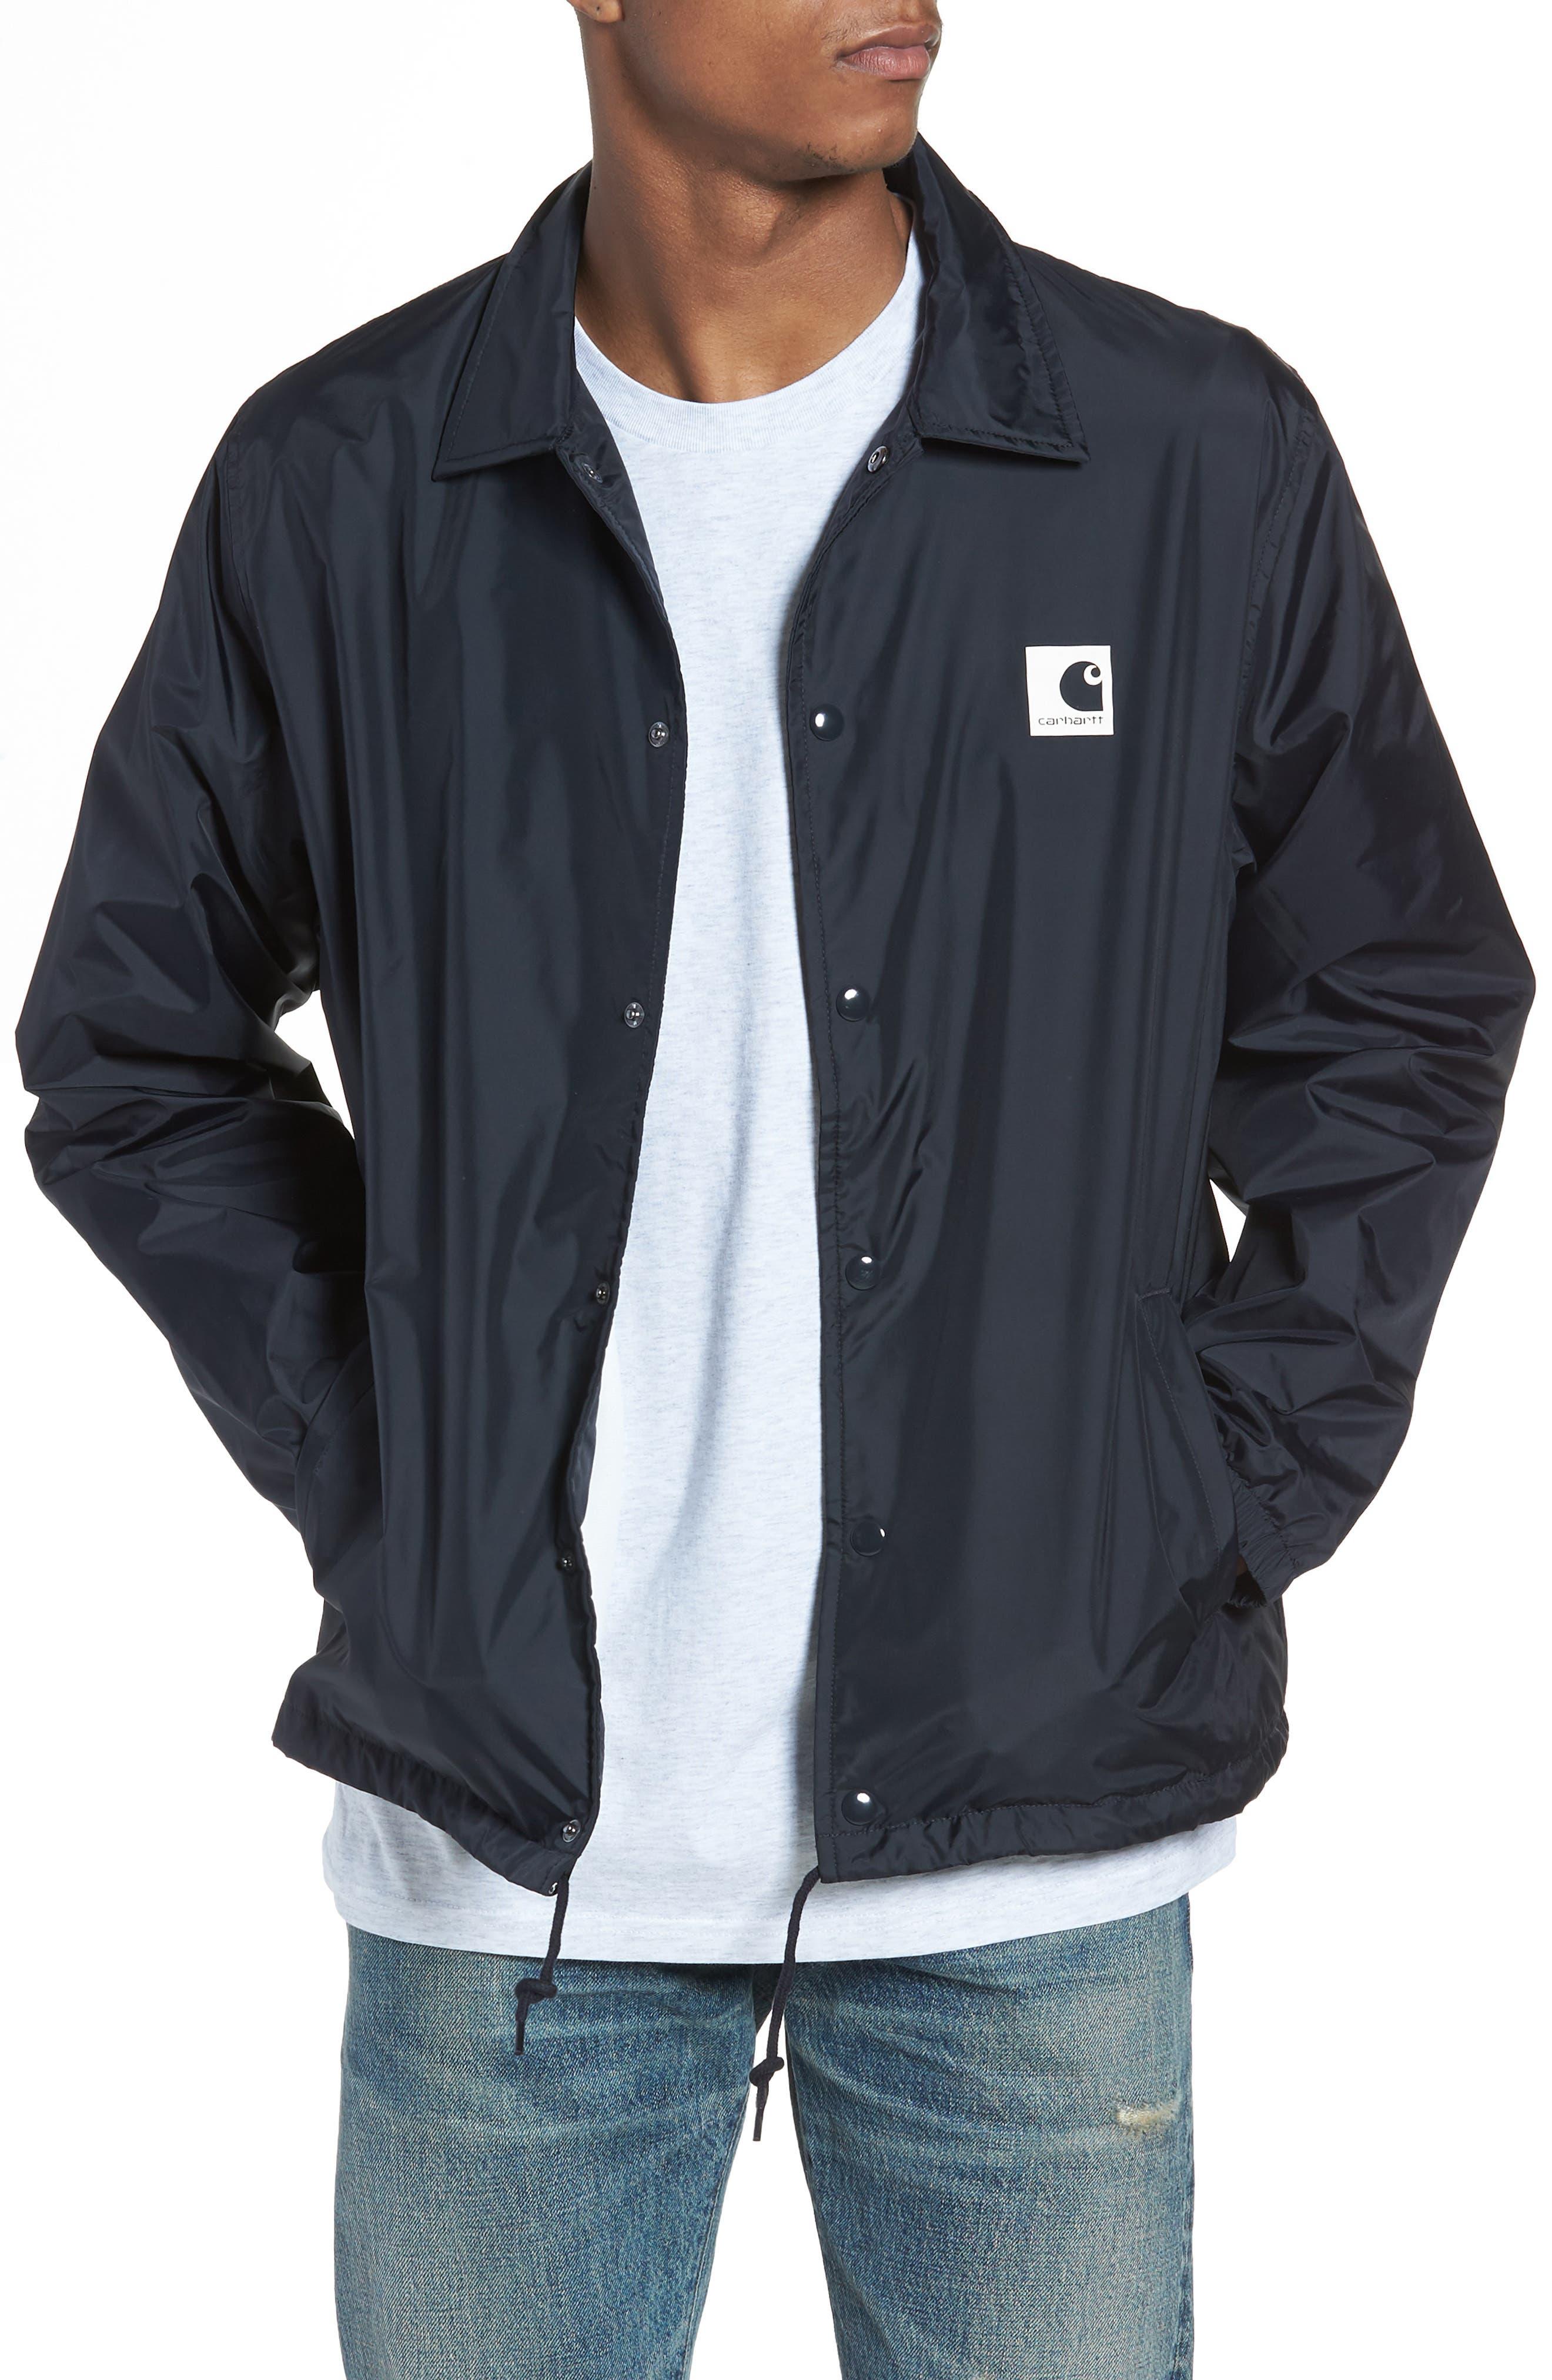 Sport Coach's Jacket,                         Main,                         color, 1C91-Dark Navy/Wax